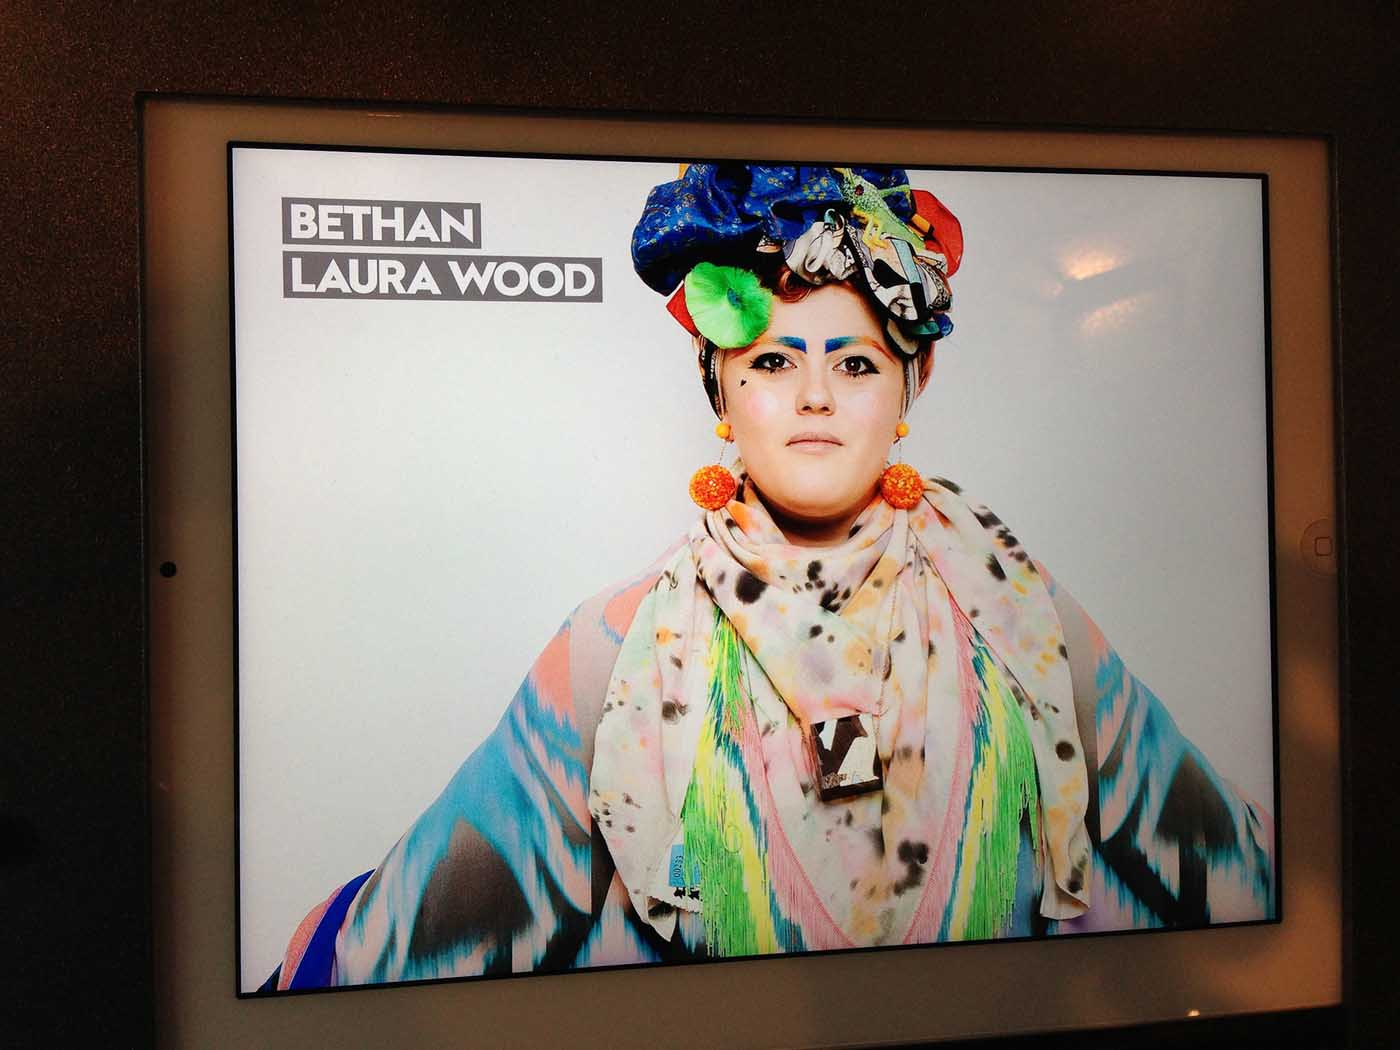 Bethan Laura Wood